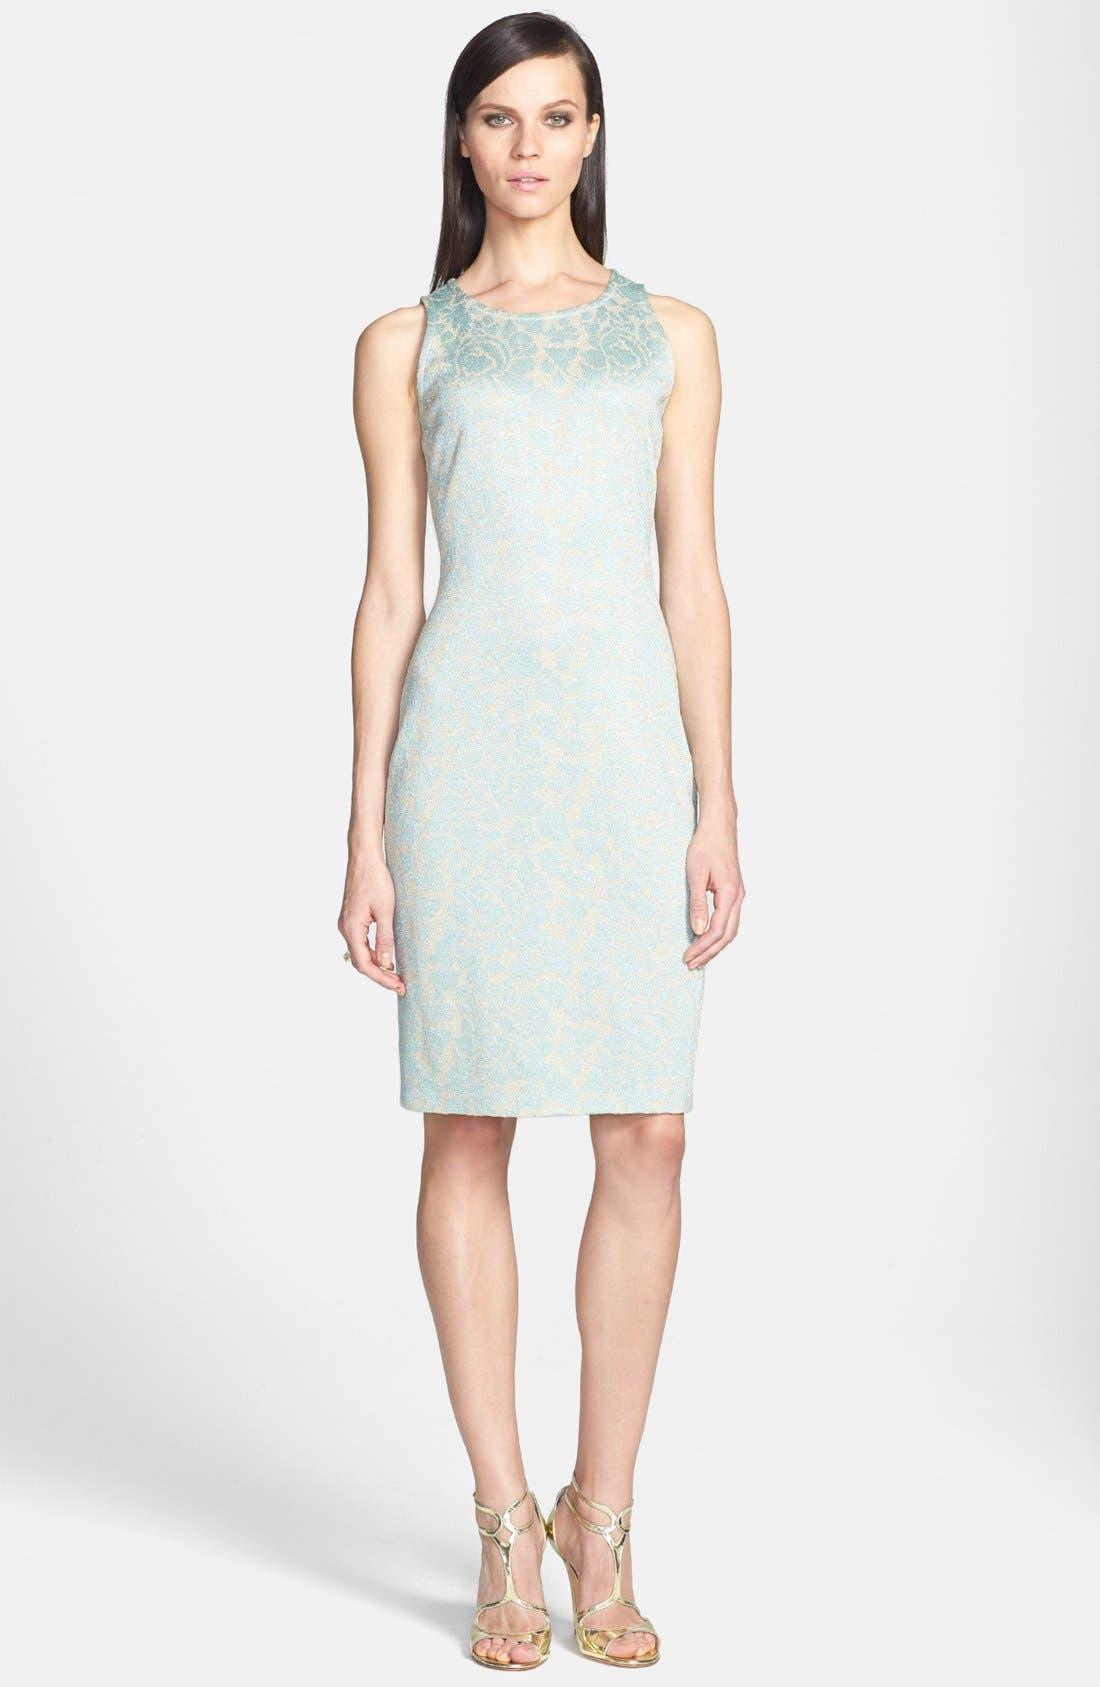 Main Image - St. John Collection Metallic Floral Jacquard Knit Sheath Dress